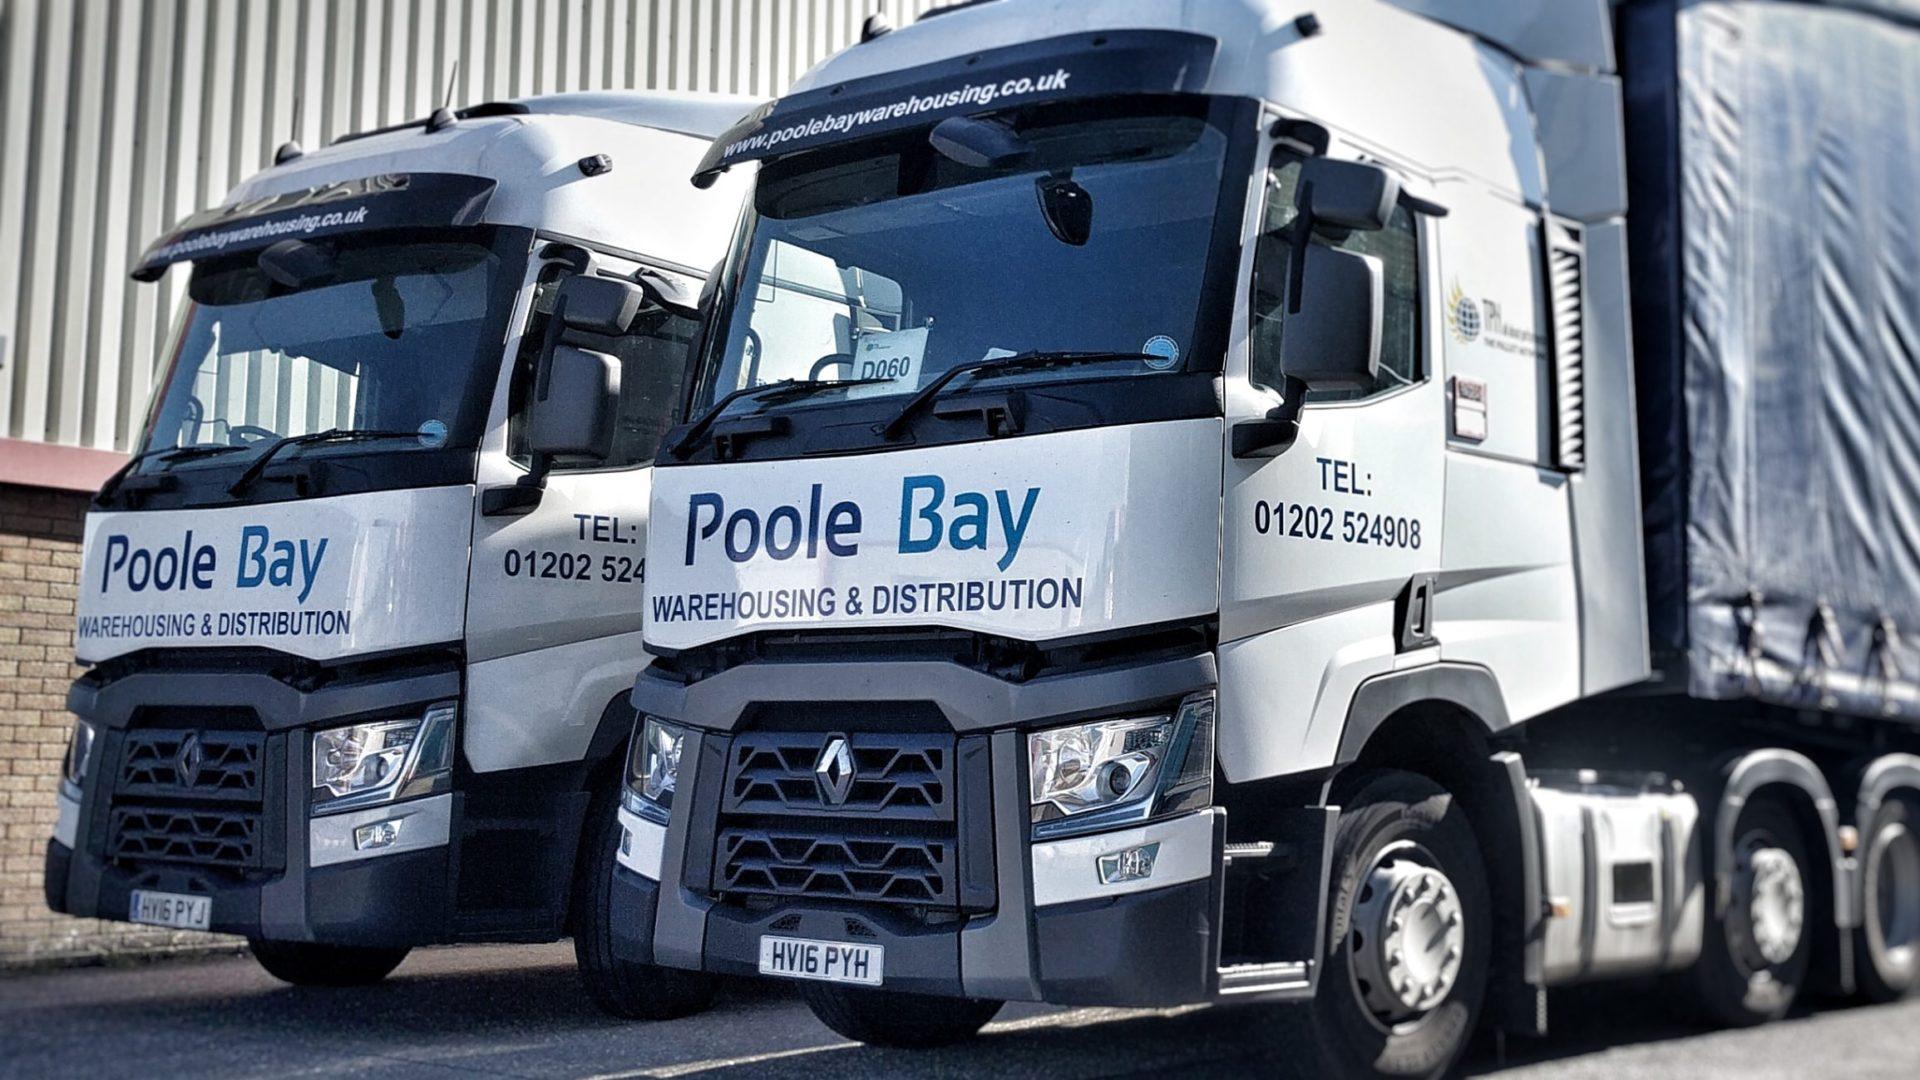 Poole Bay Warehousing